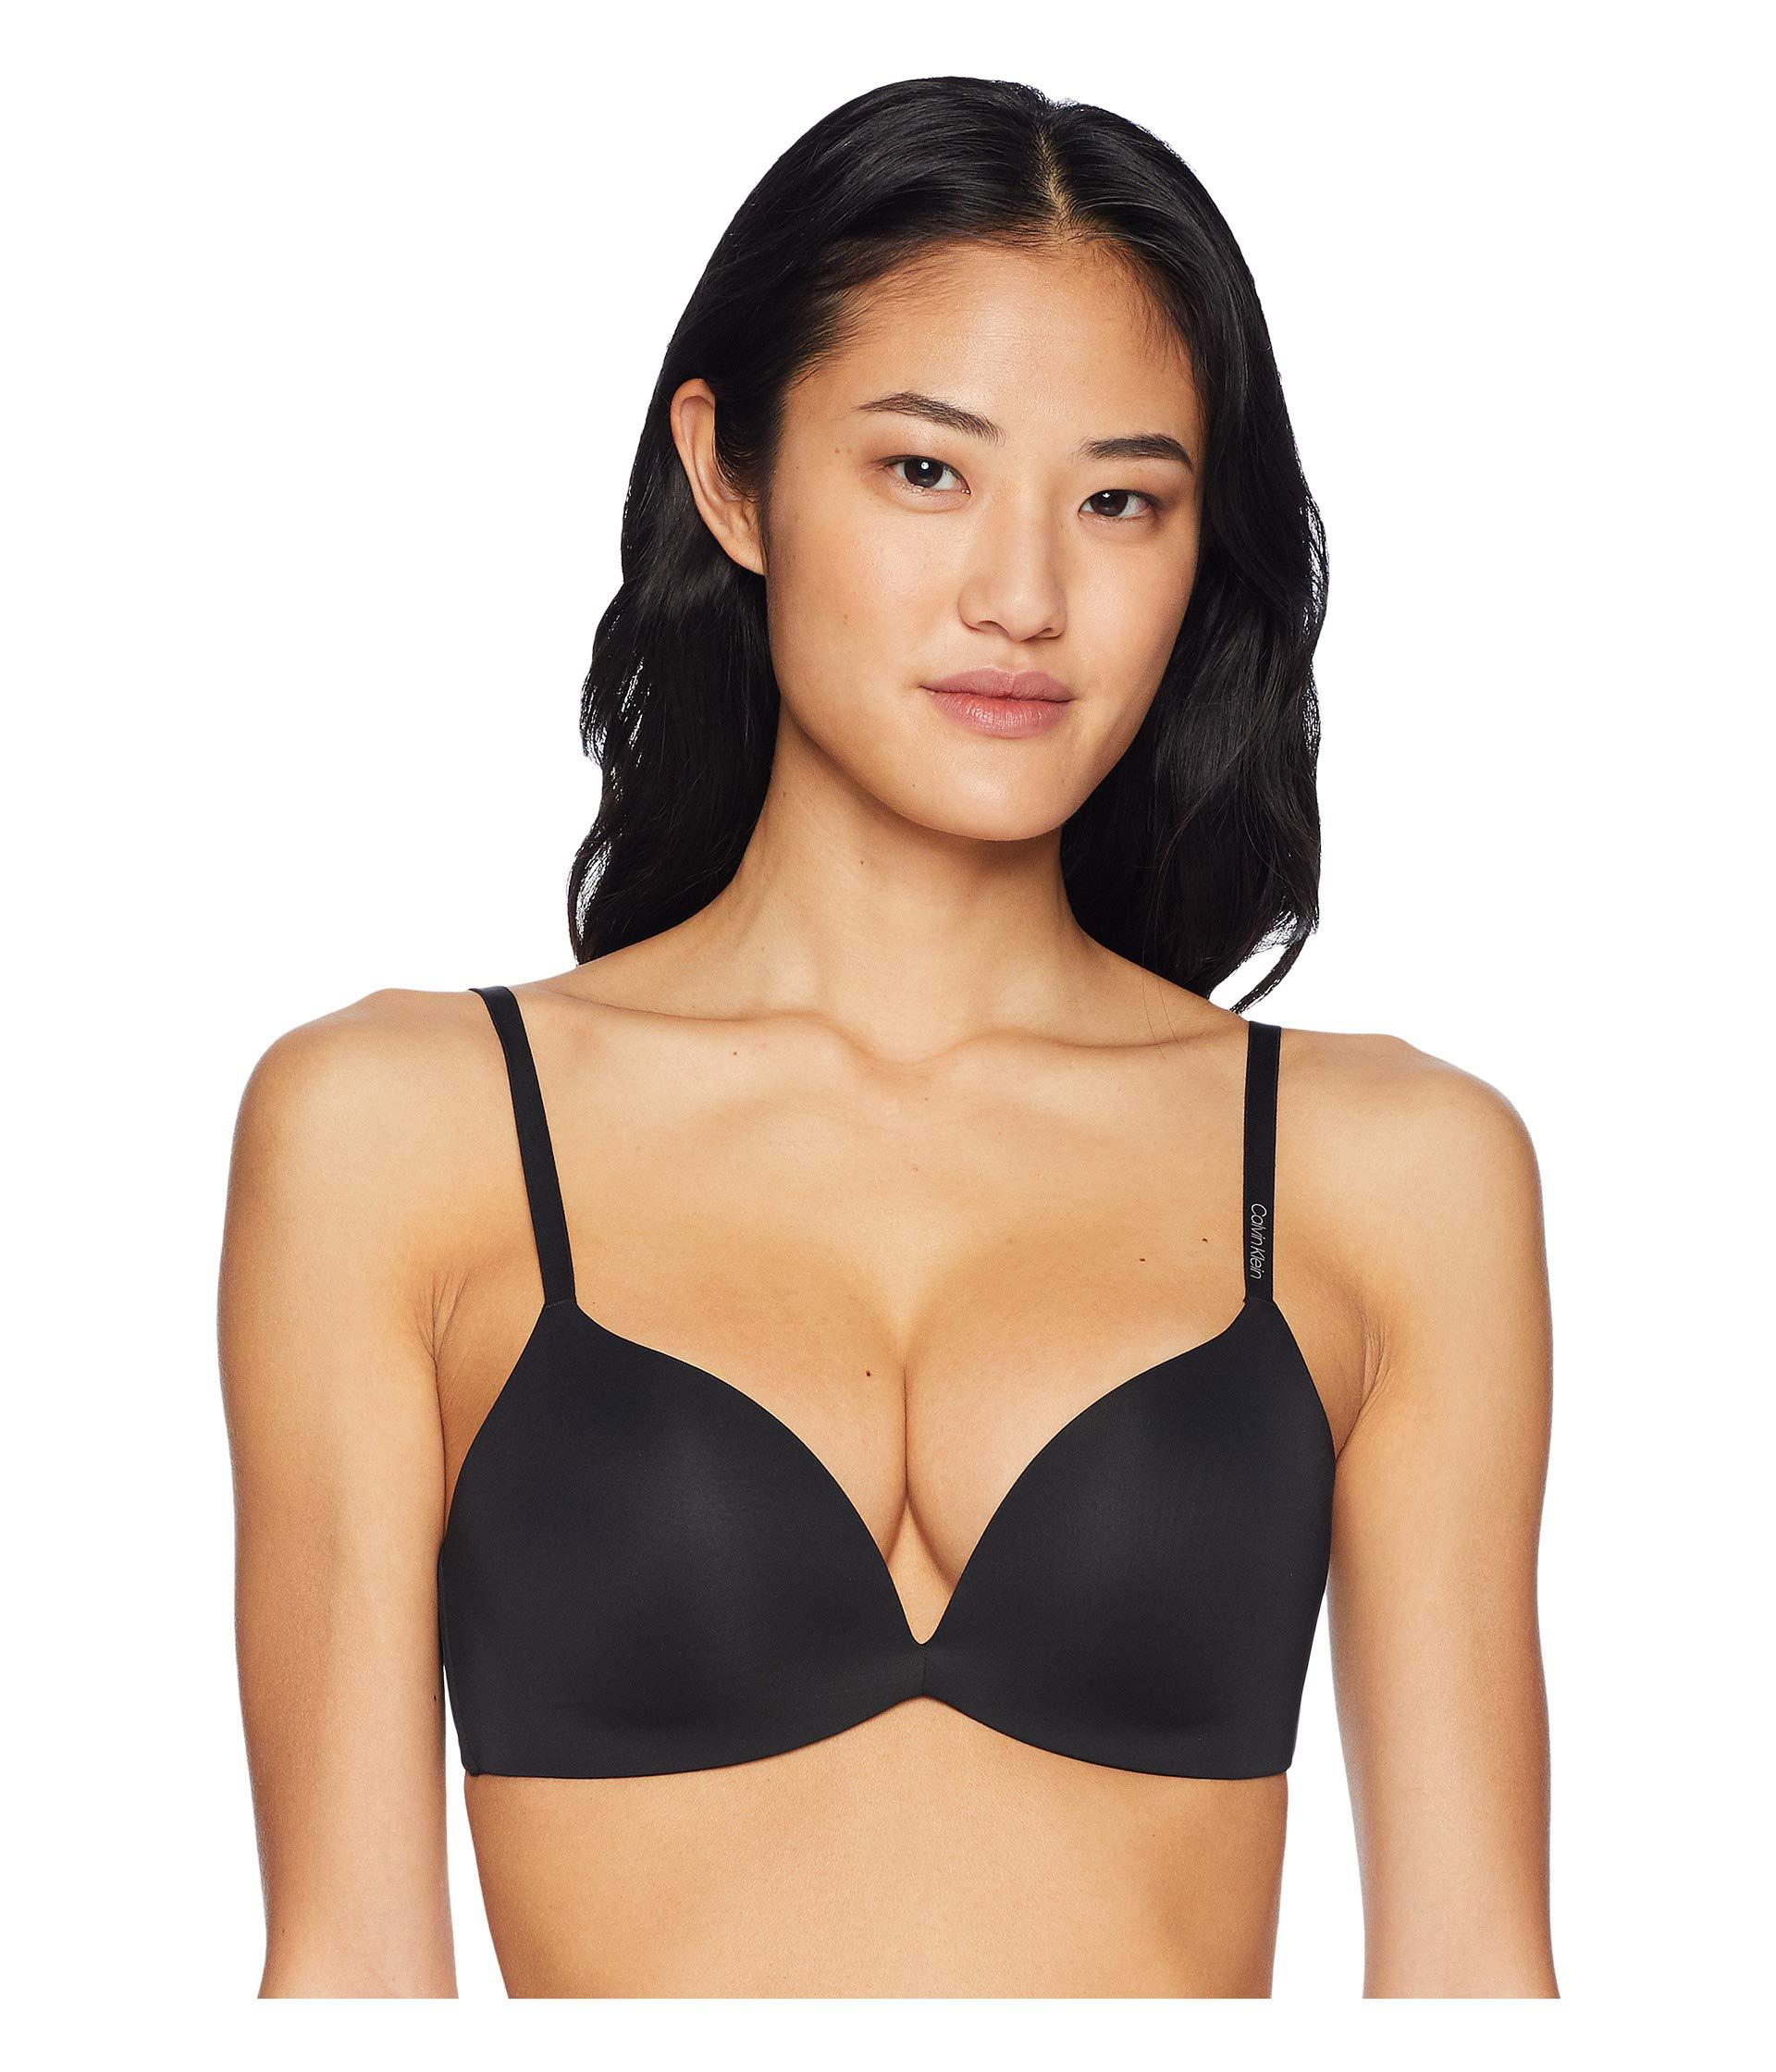 52f5f5abb33 Calvin Klein - Form Push-up Plunge Bra (black) Women s Bra - Lyst. View  fullscreen